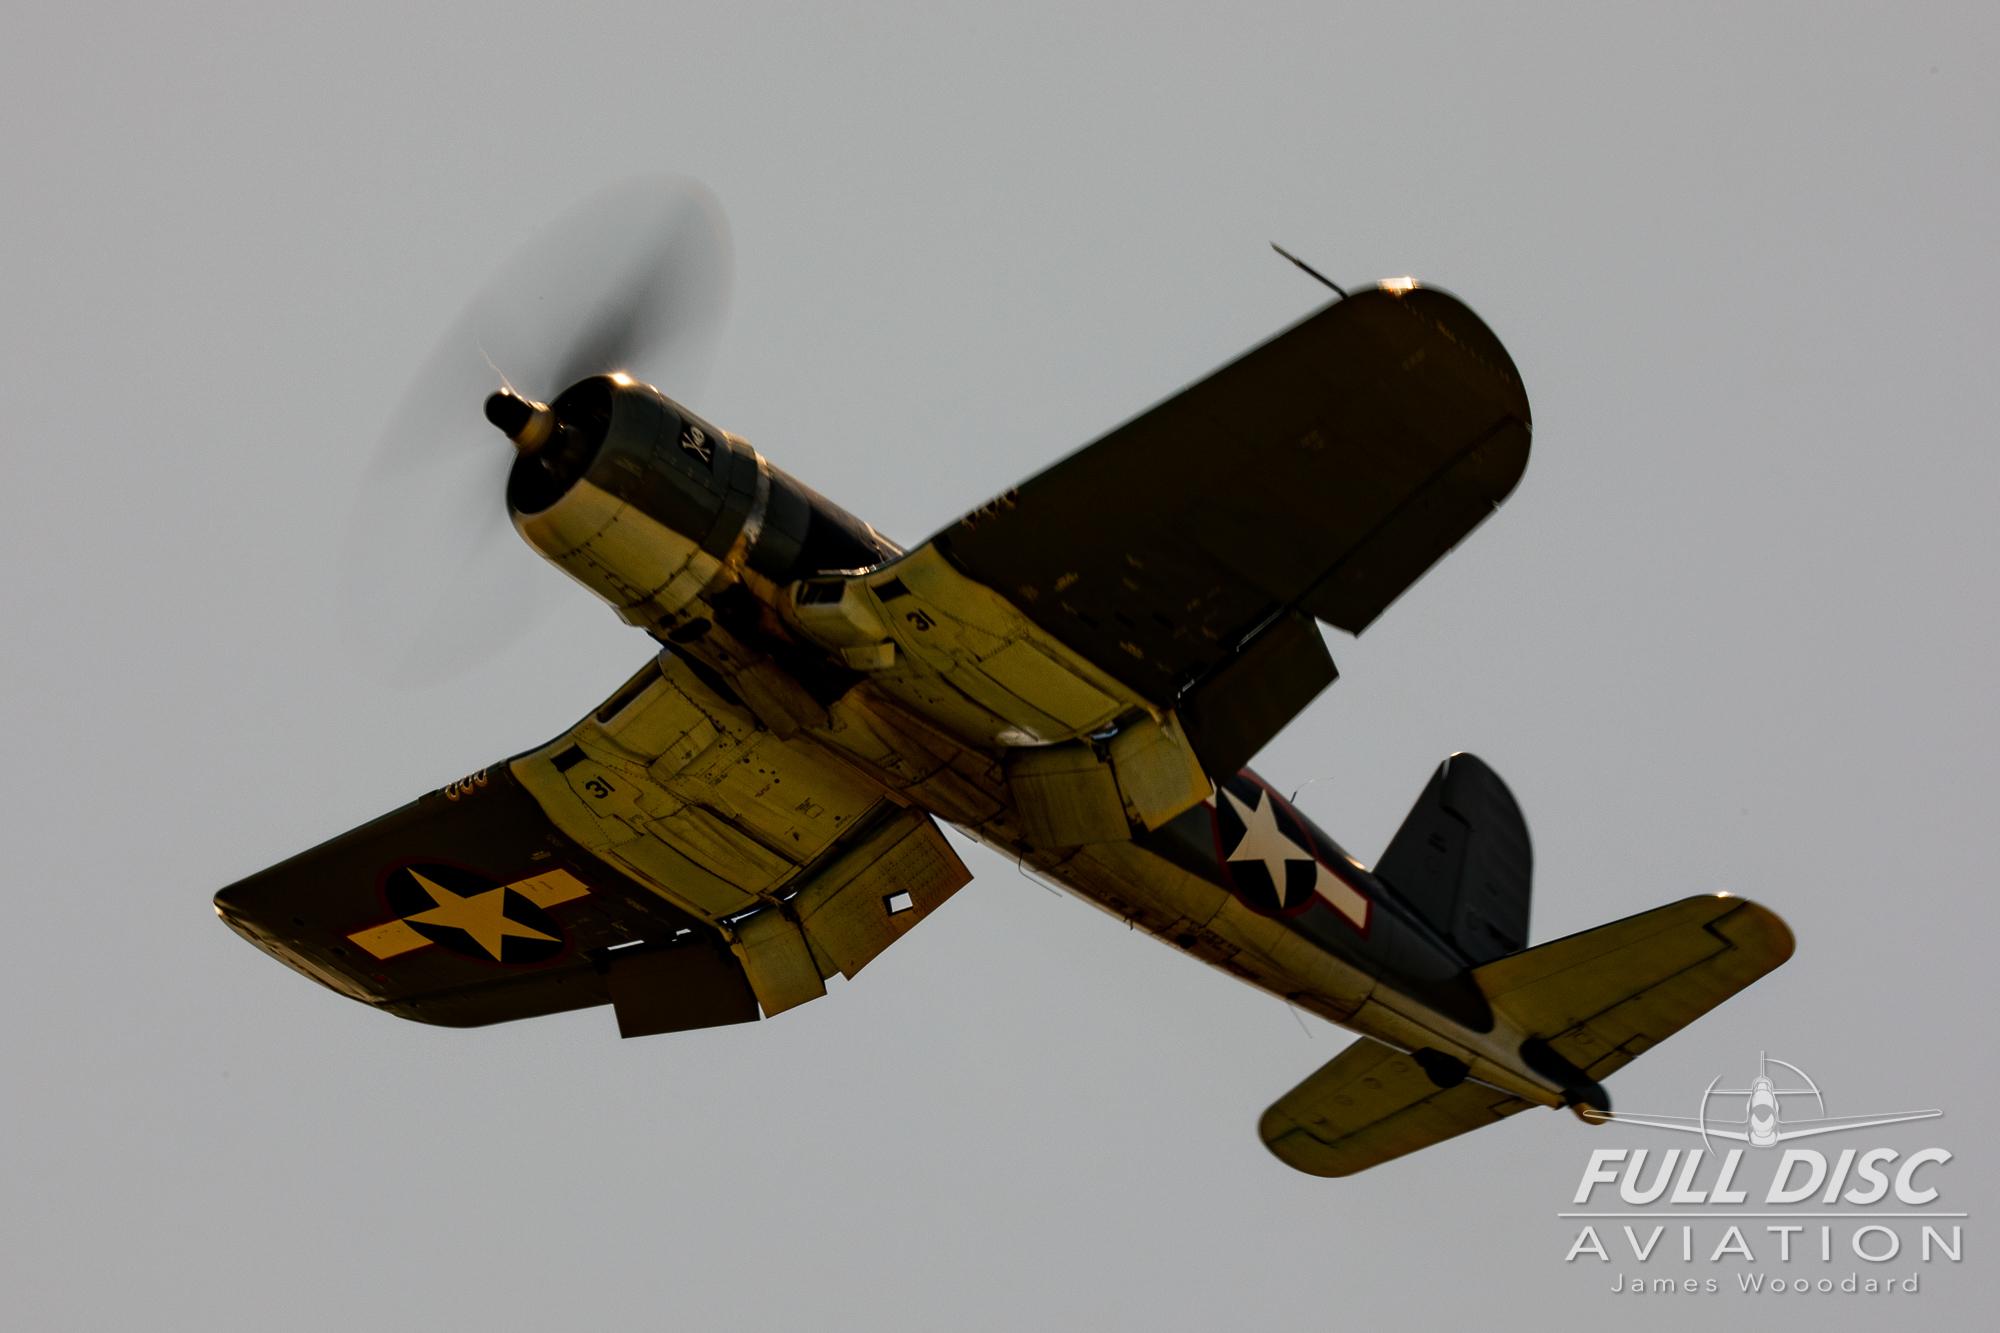 WarbirdsOverTheBeach_FullDiscAviation_JamesWoodard-May 18, 2019-93.jpg